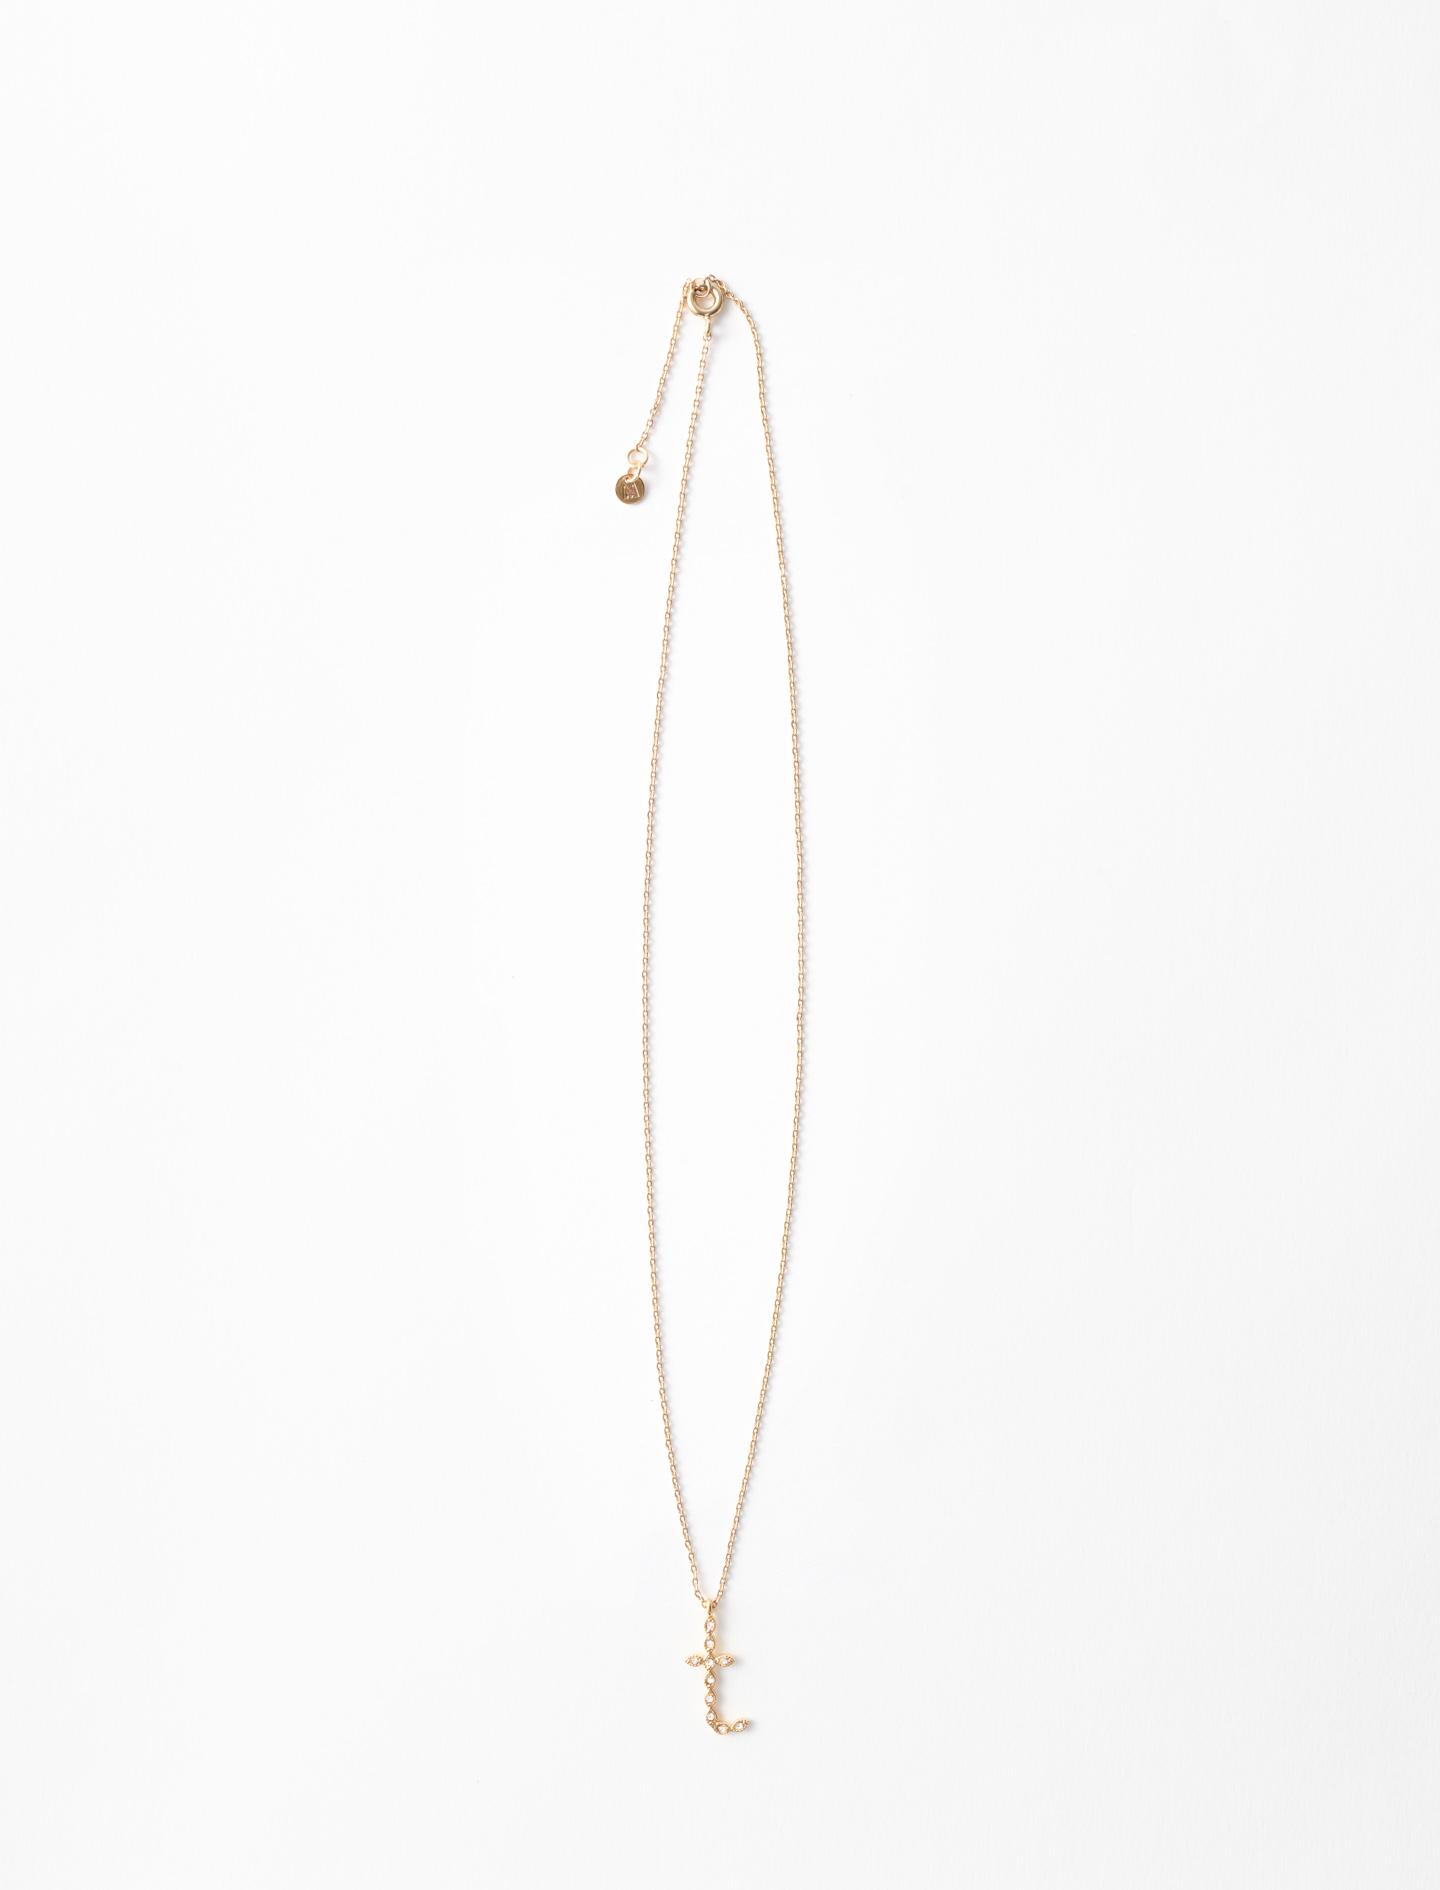 Rhinestone T necklace - Gold